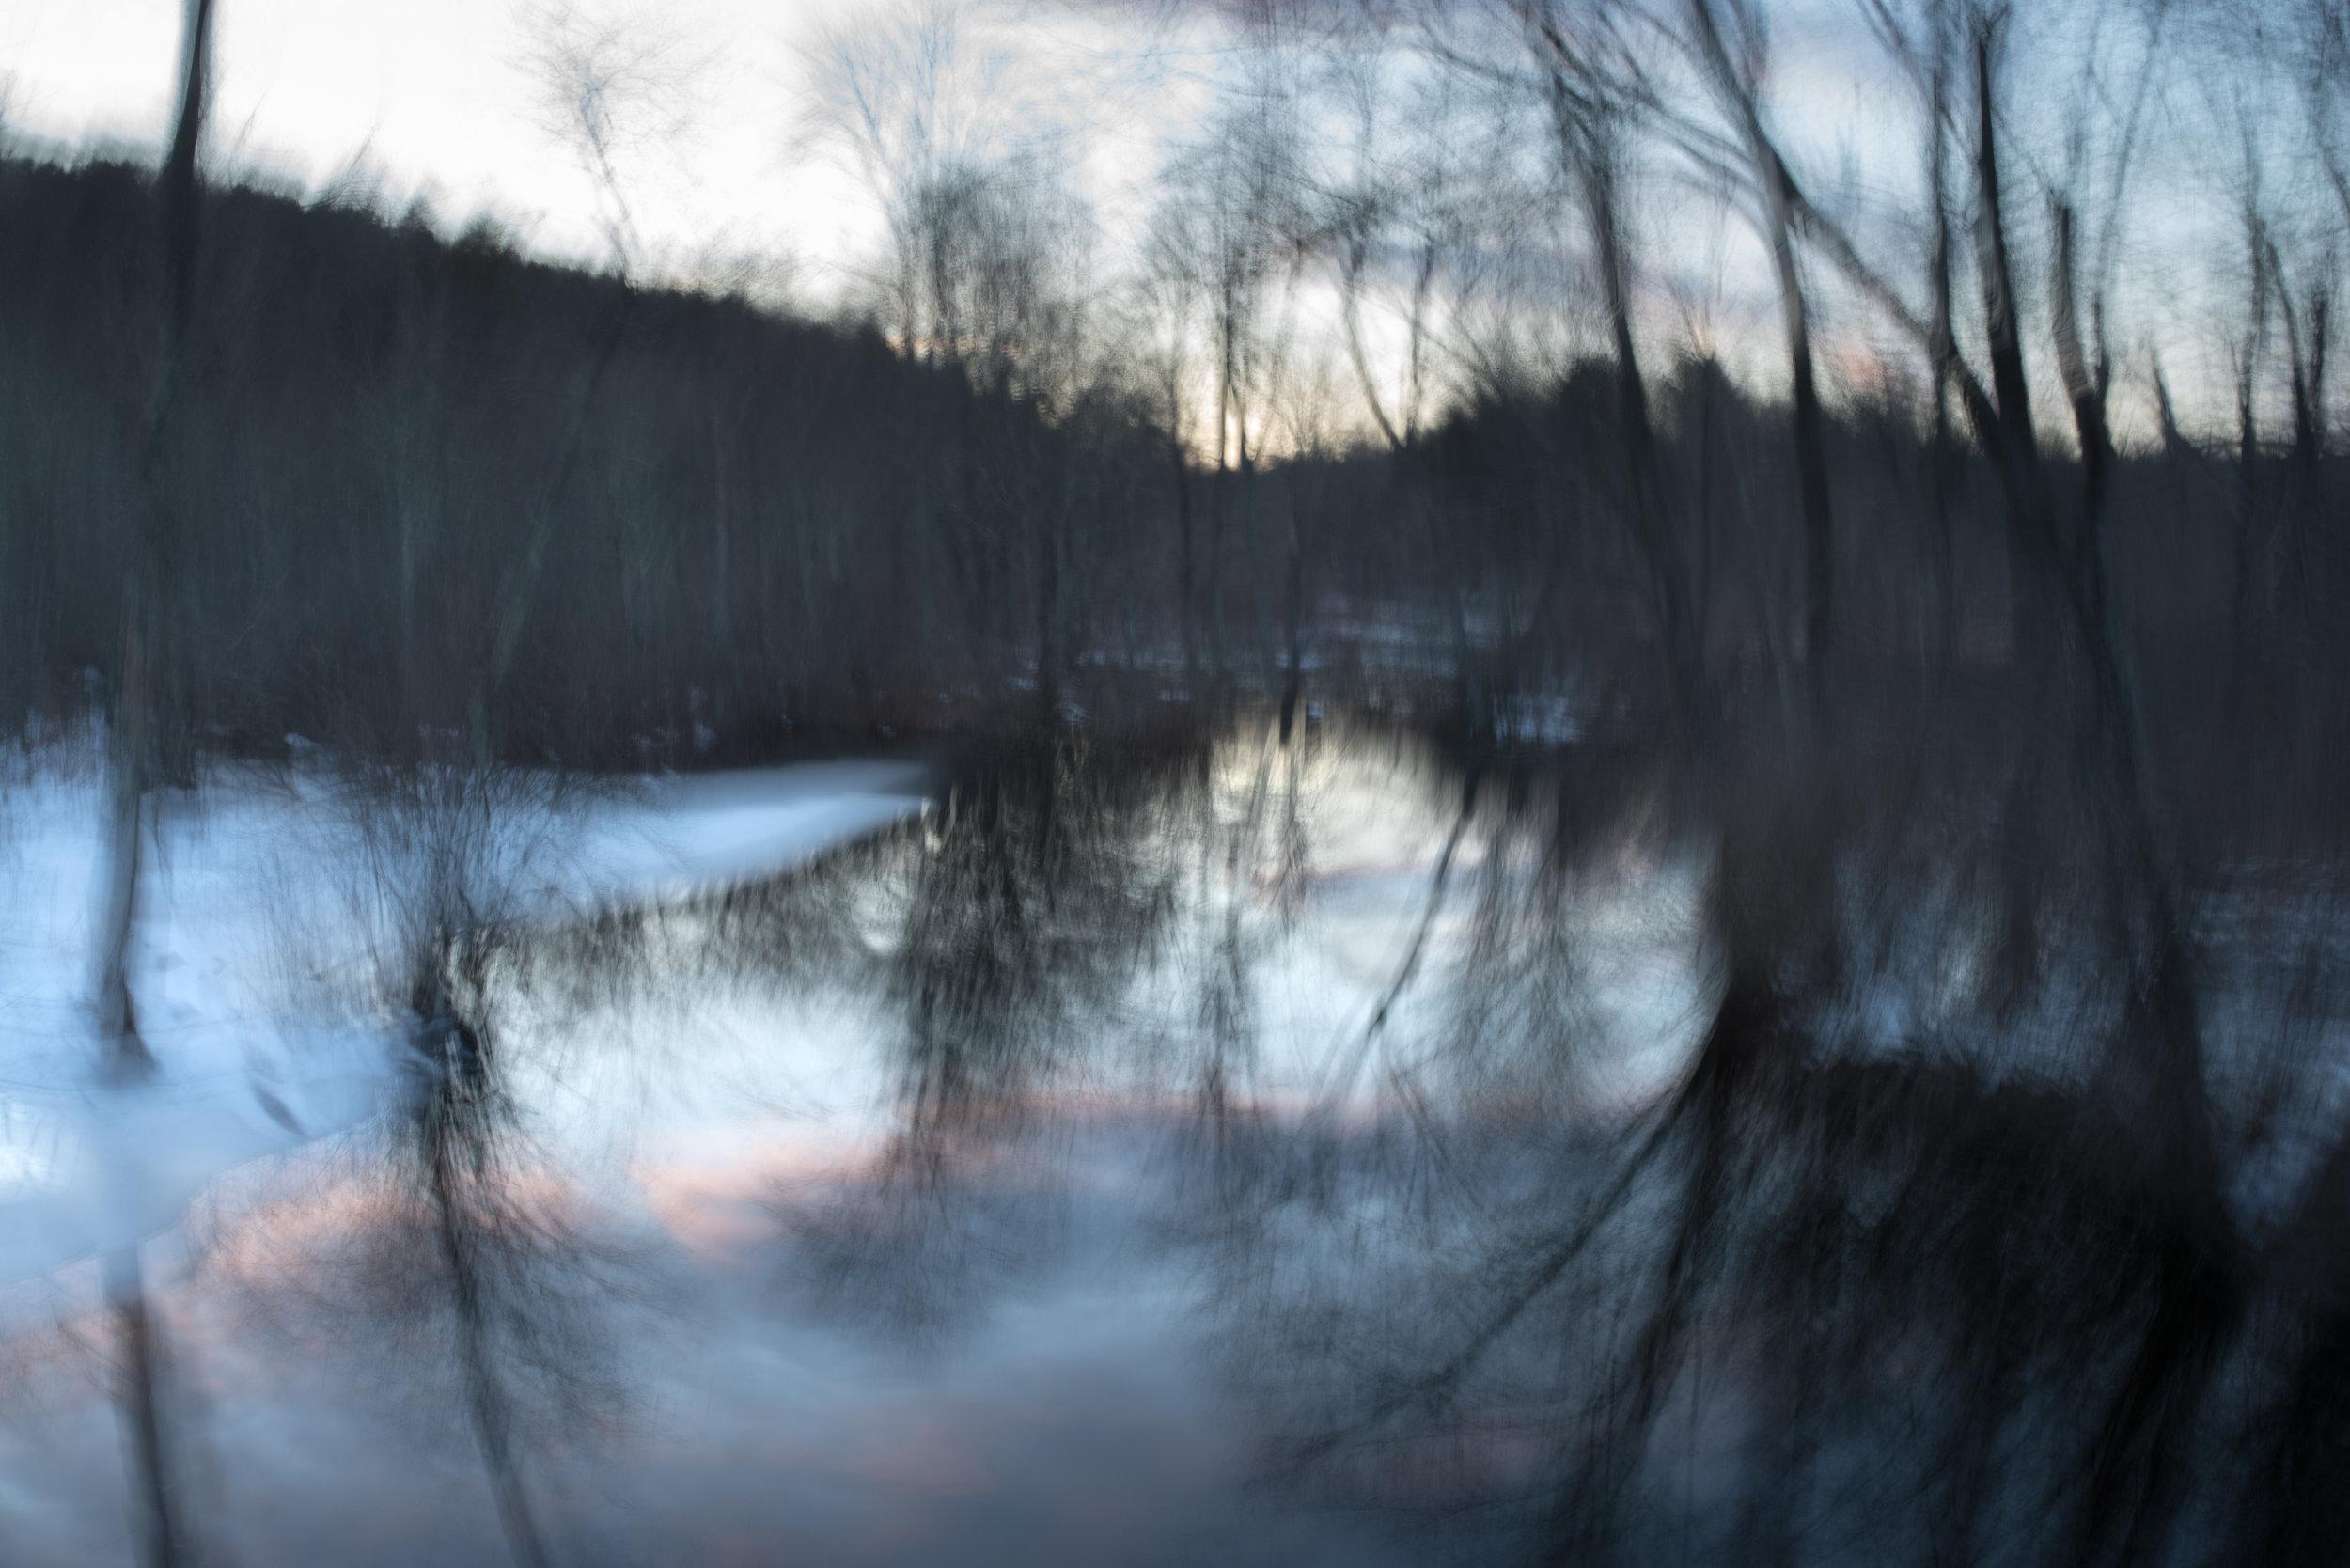 dreamy_reflection_winter_pond_2.jpg